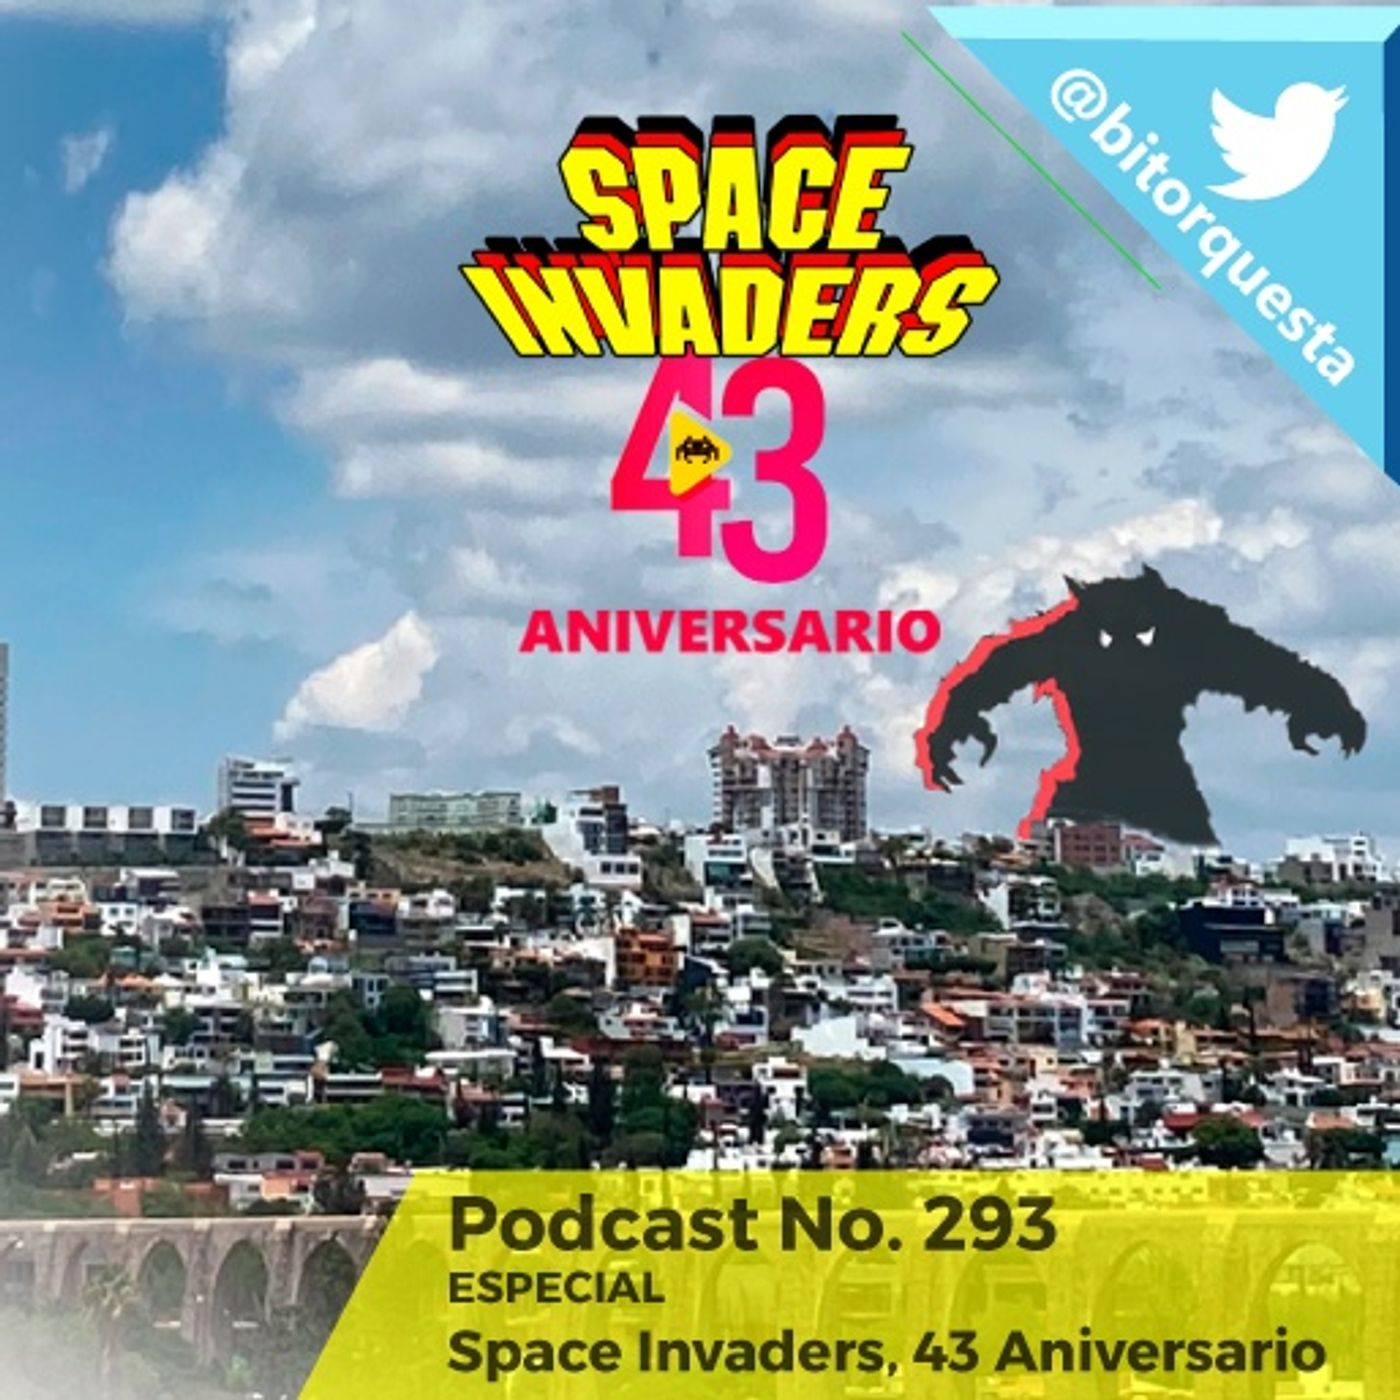 293 - Space Invaders, 43 Aniversario